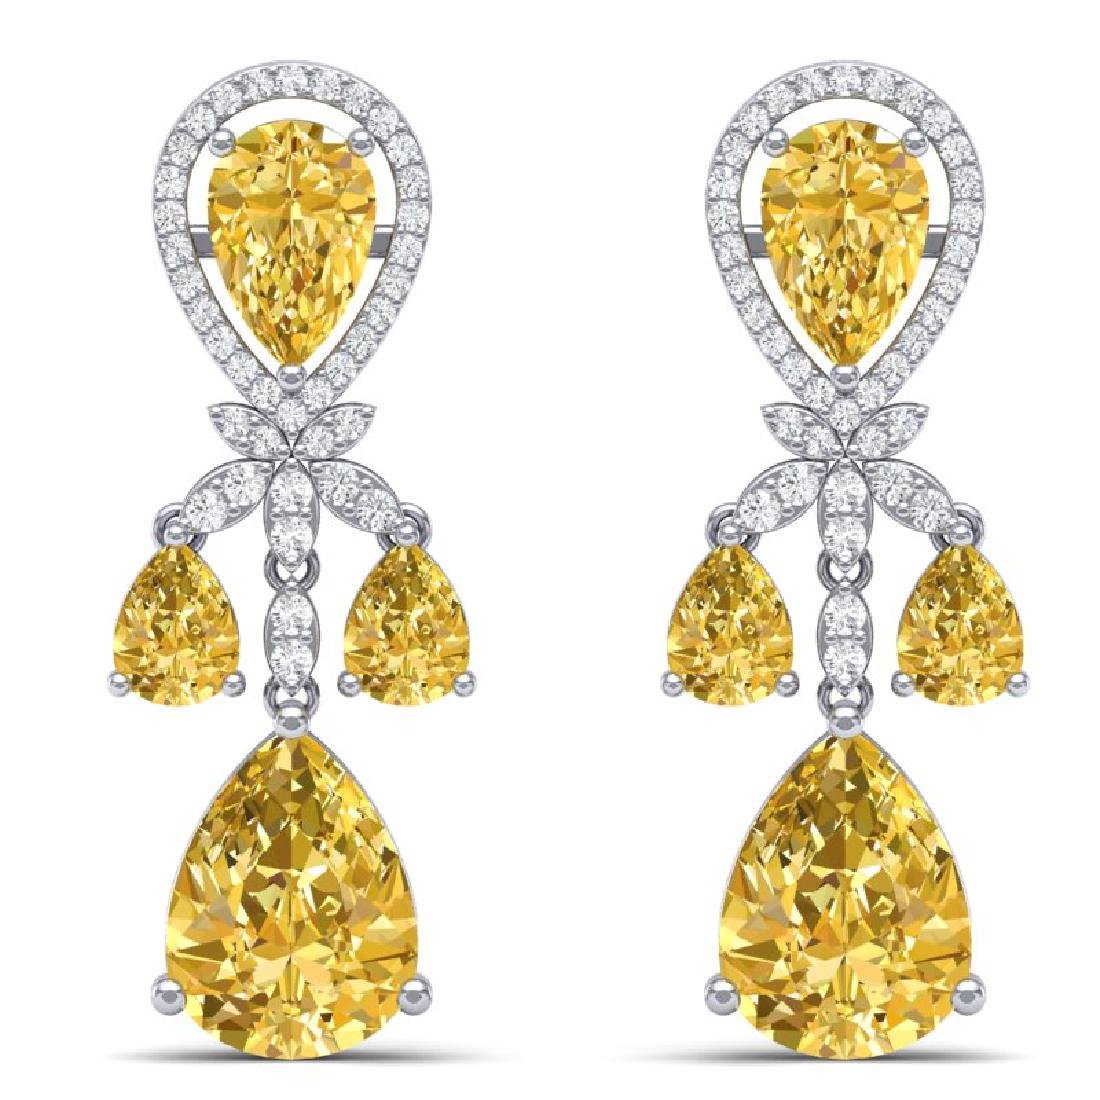 35.67 CTW Royalty Canary Citrine & VS Diamond Earrings